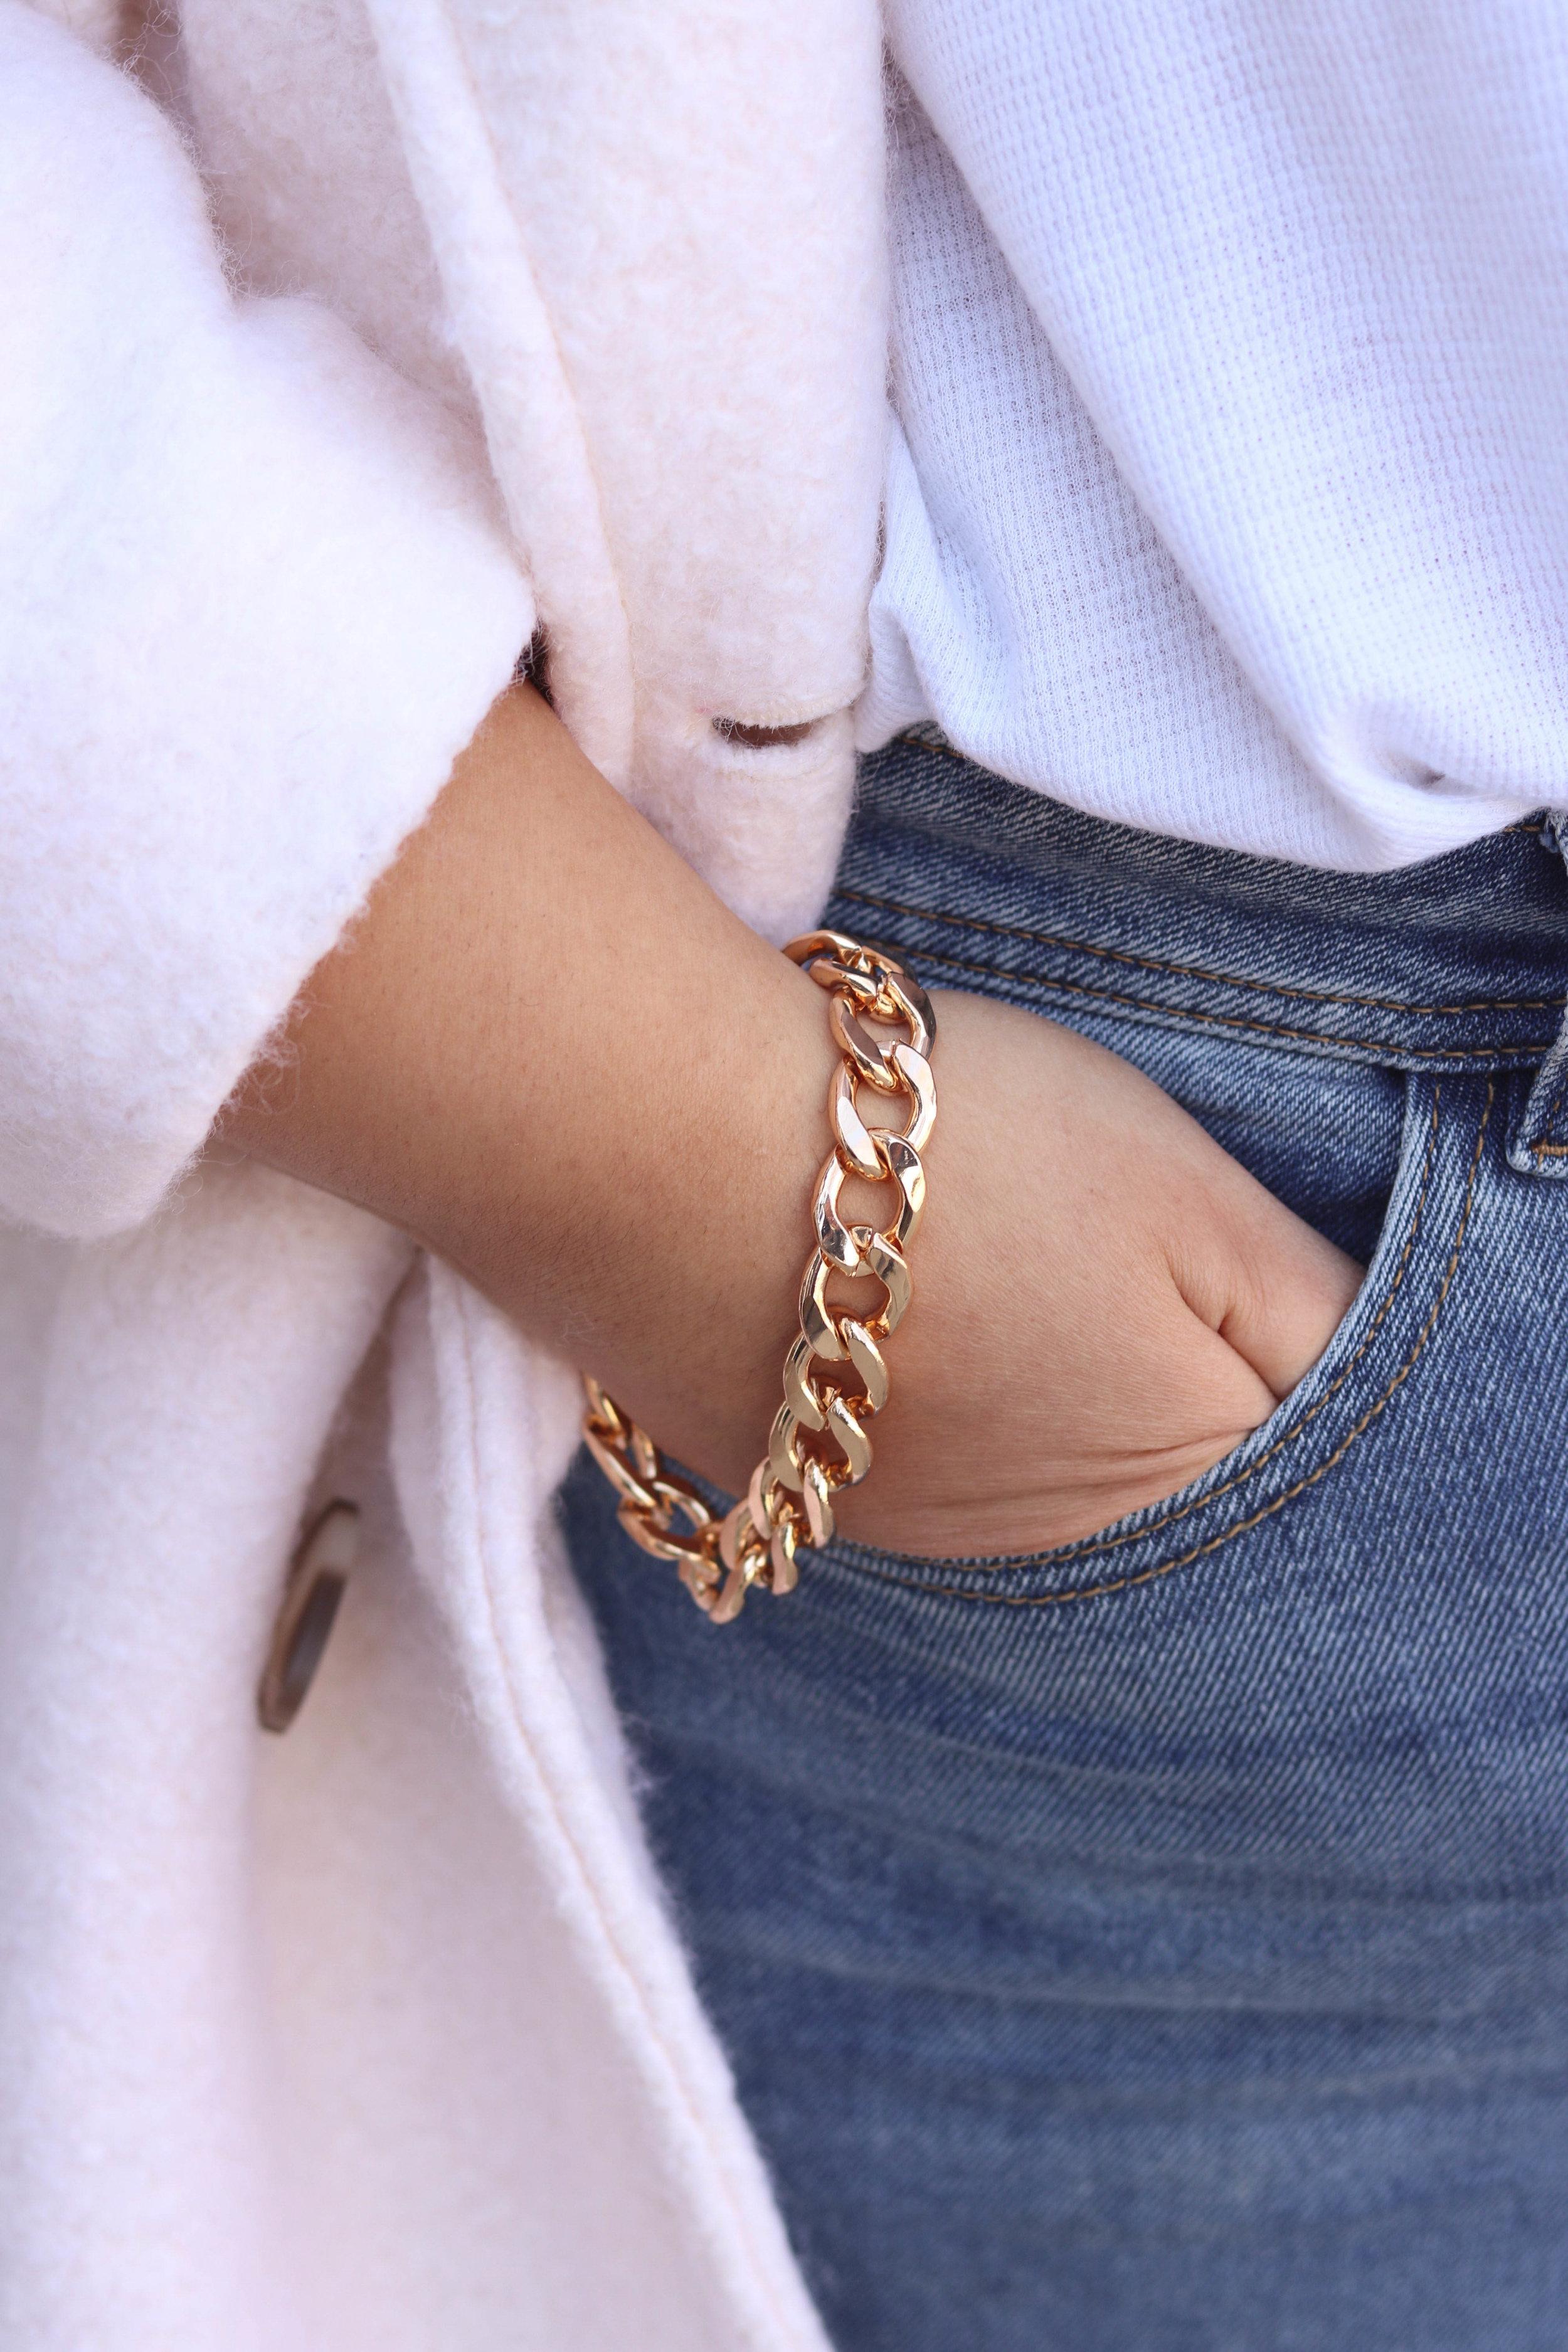 plus size bracelet 8.jpg